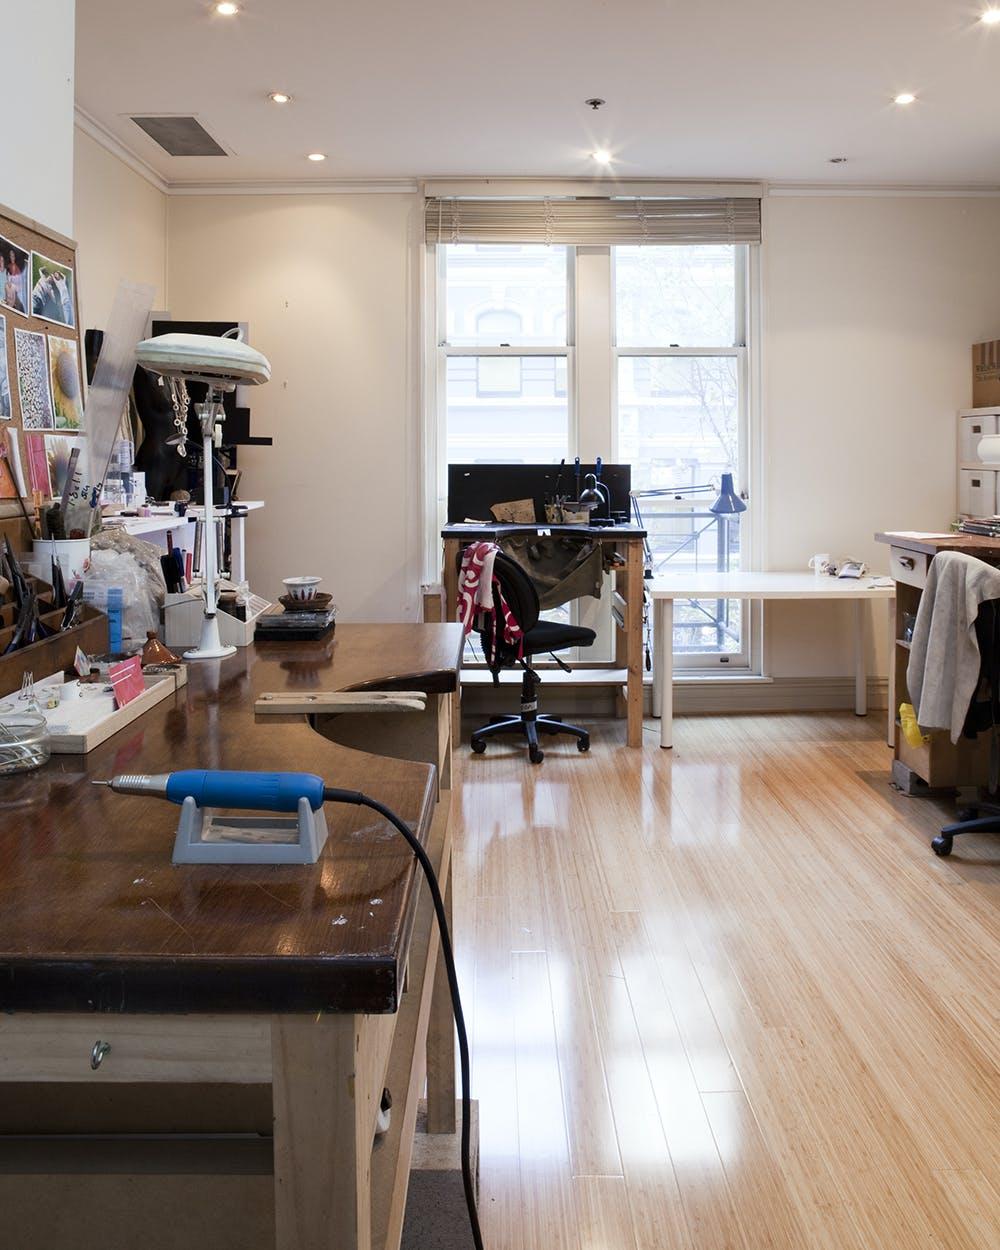 Studio Space, creative studio at Gaffa, image 1